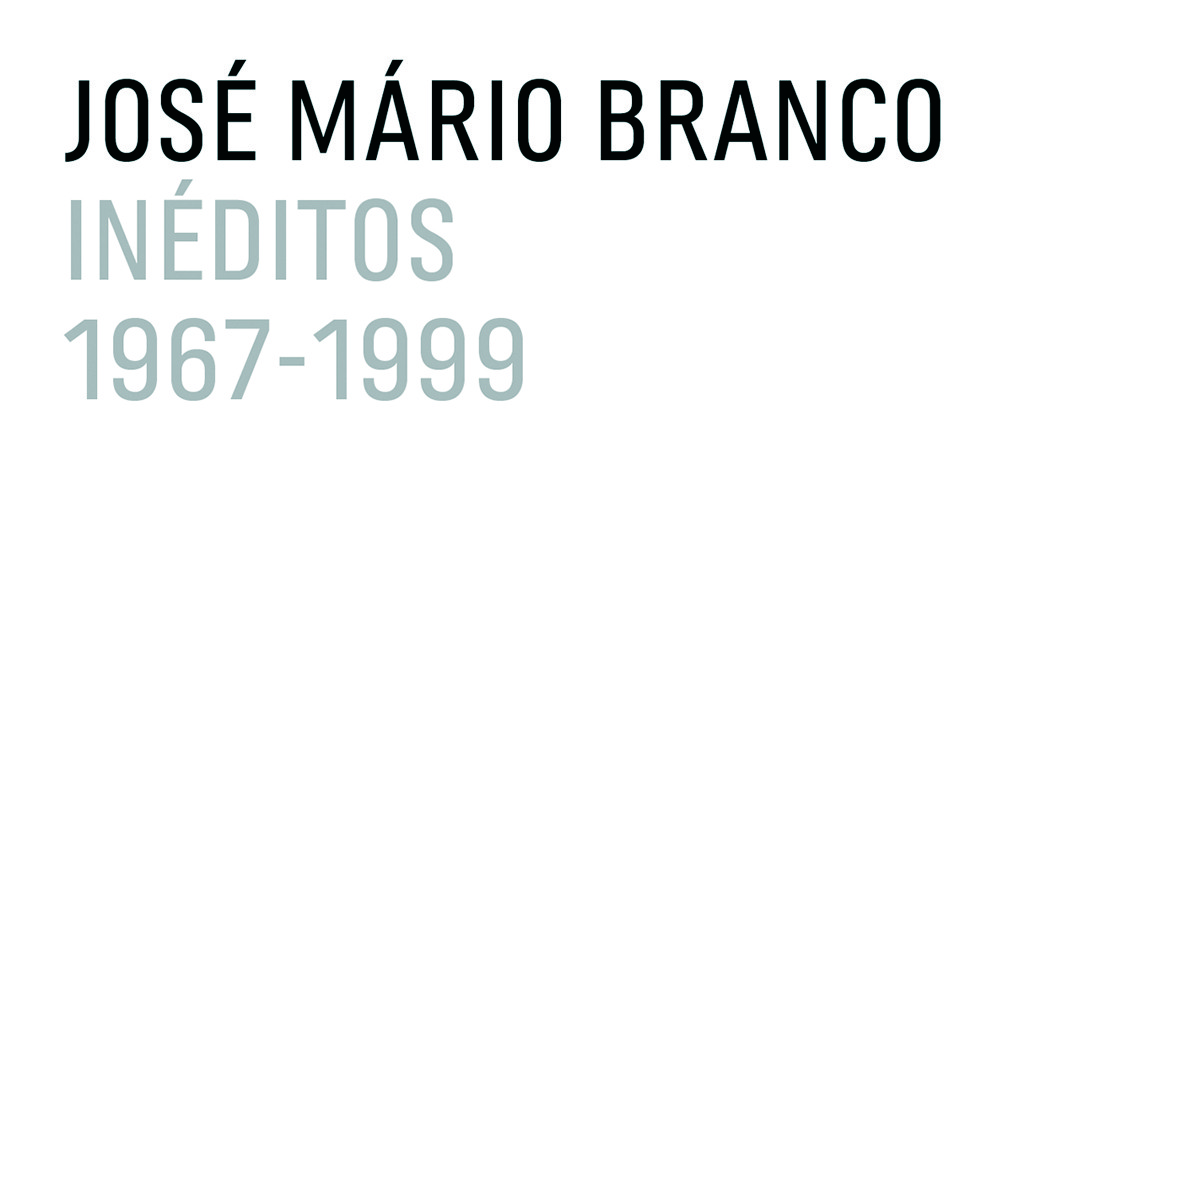 JMB-INÉDITOS_capa.jpg